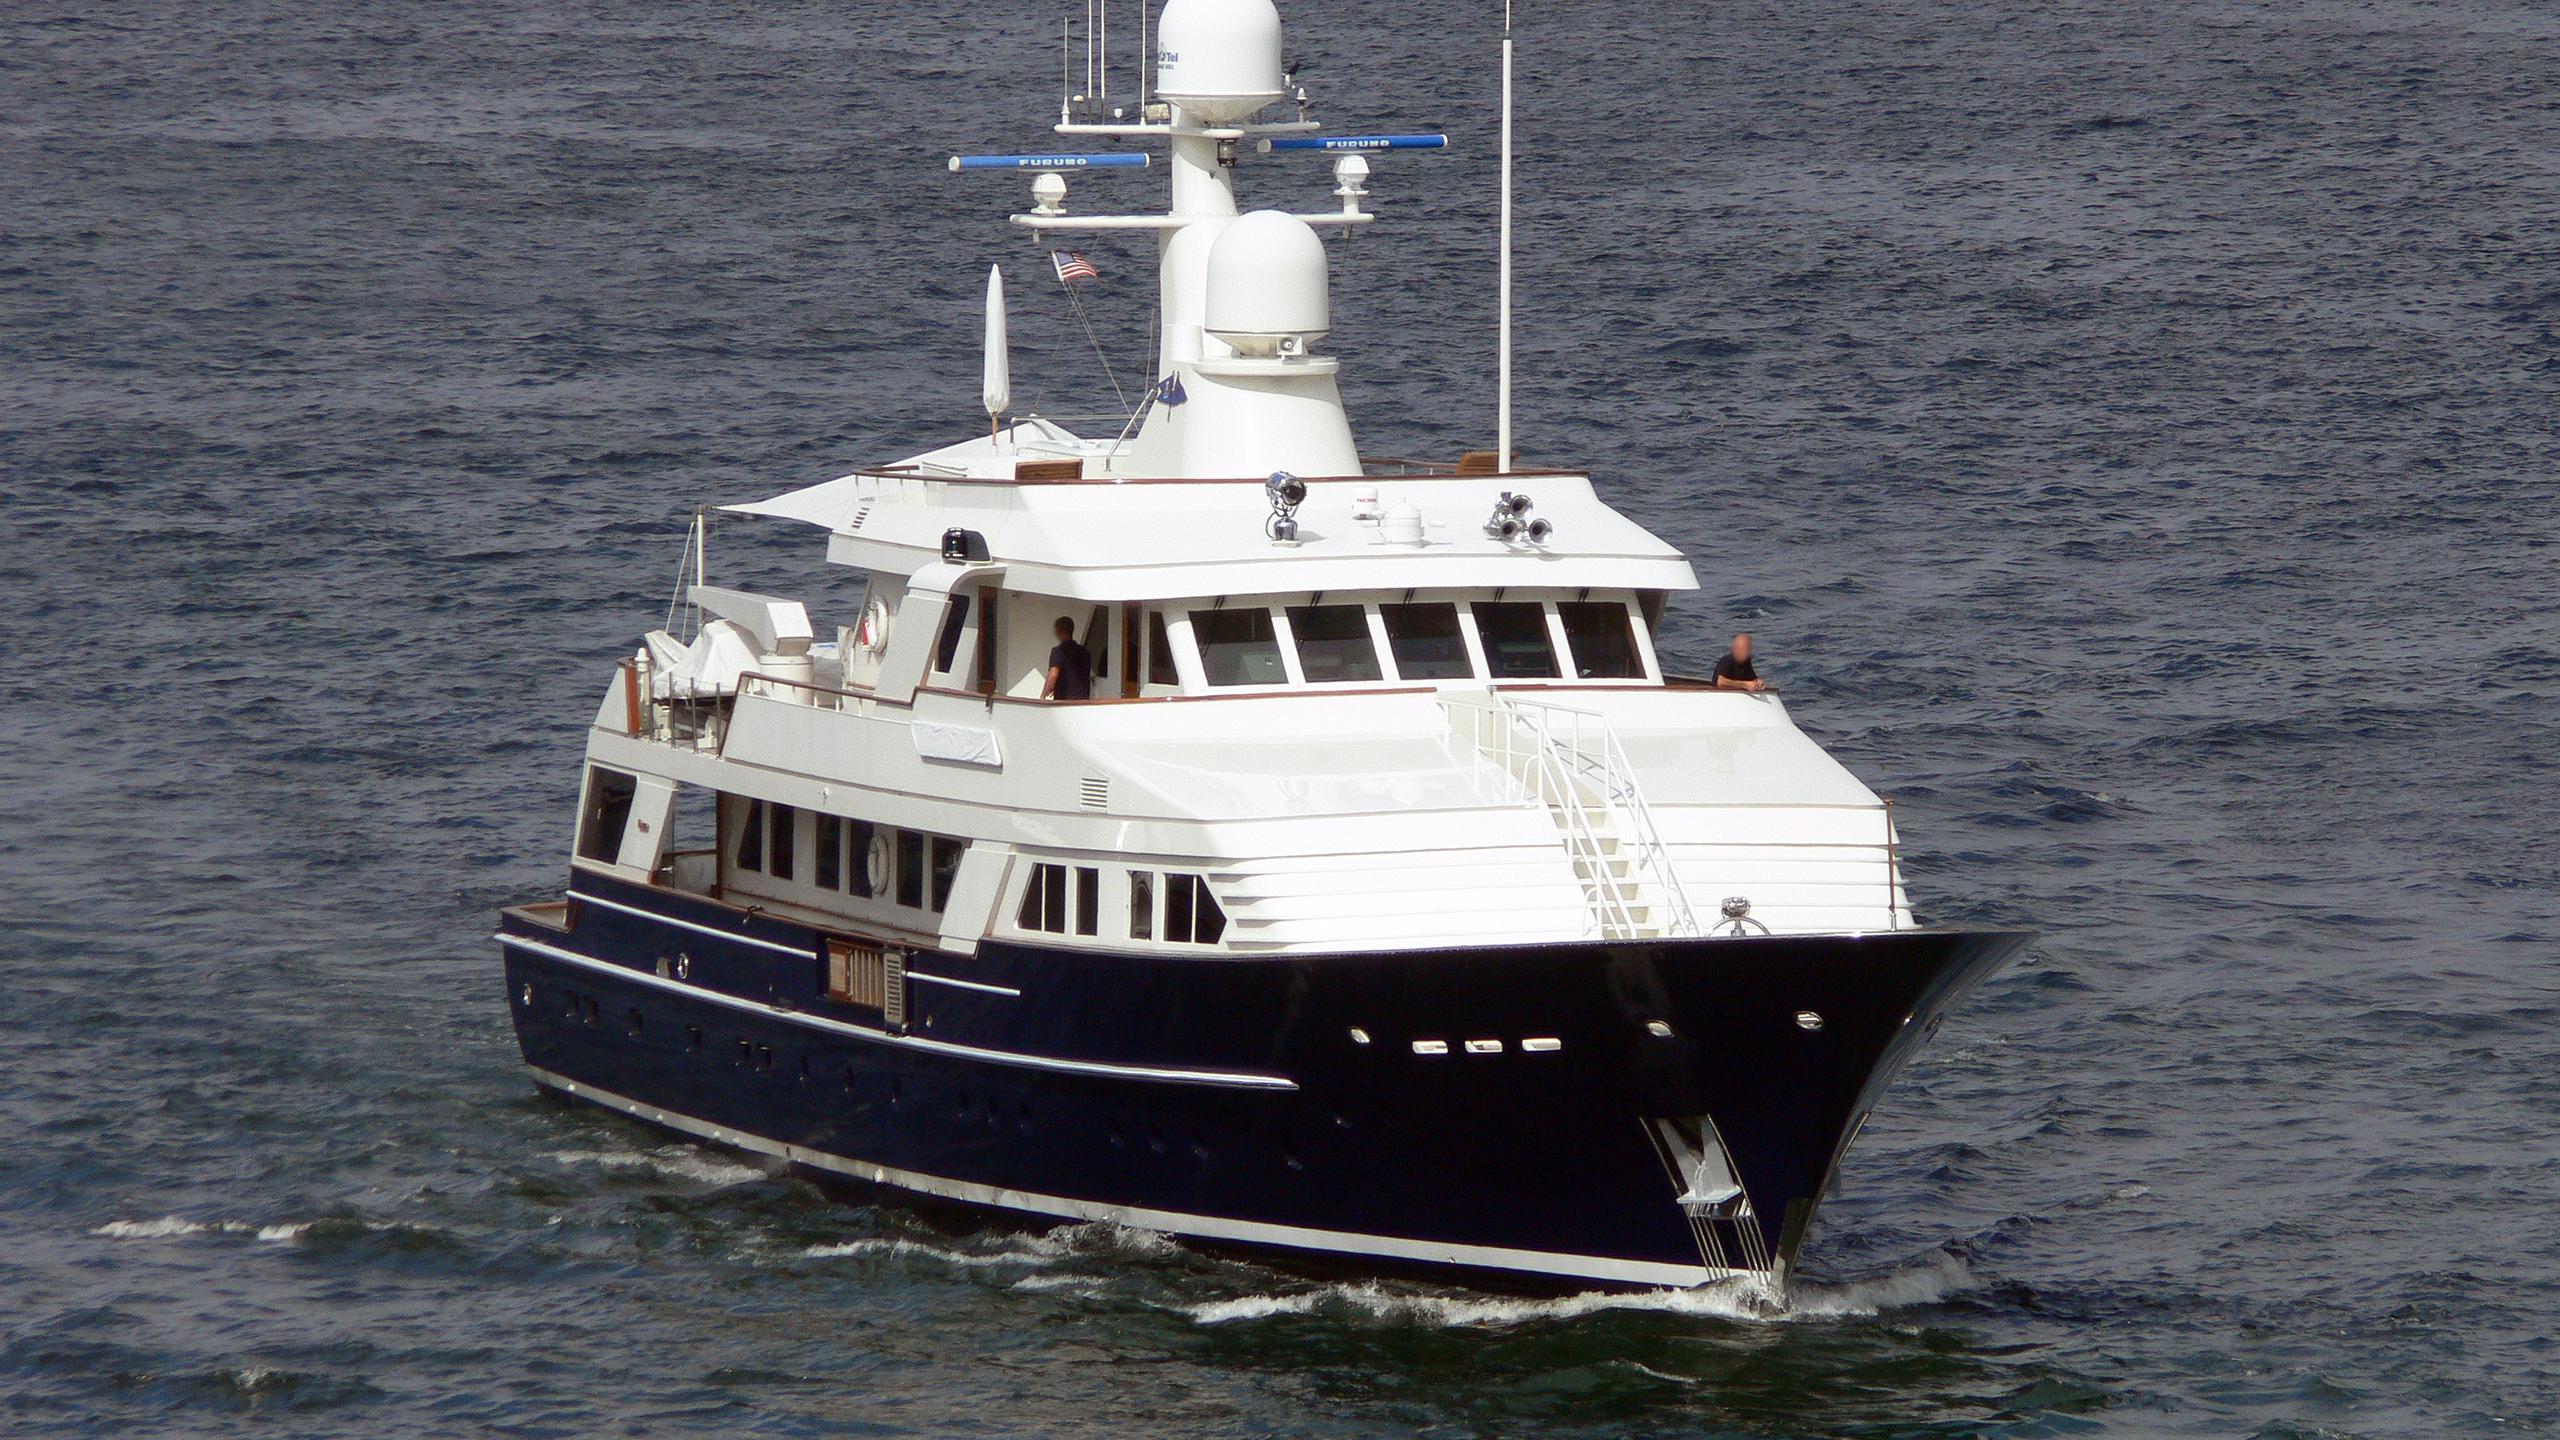 miss-iloilo-motor-yacht-feadship-1986-39m-half-profile